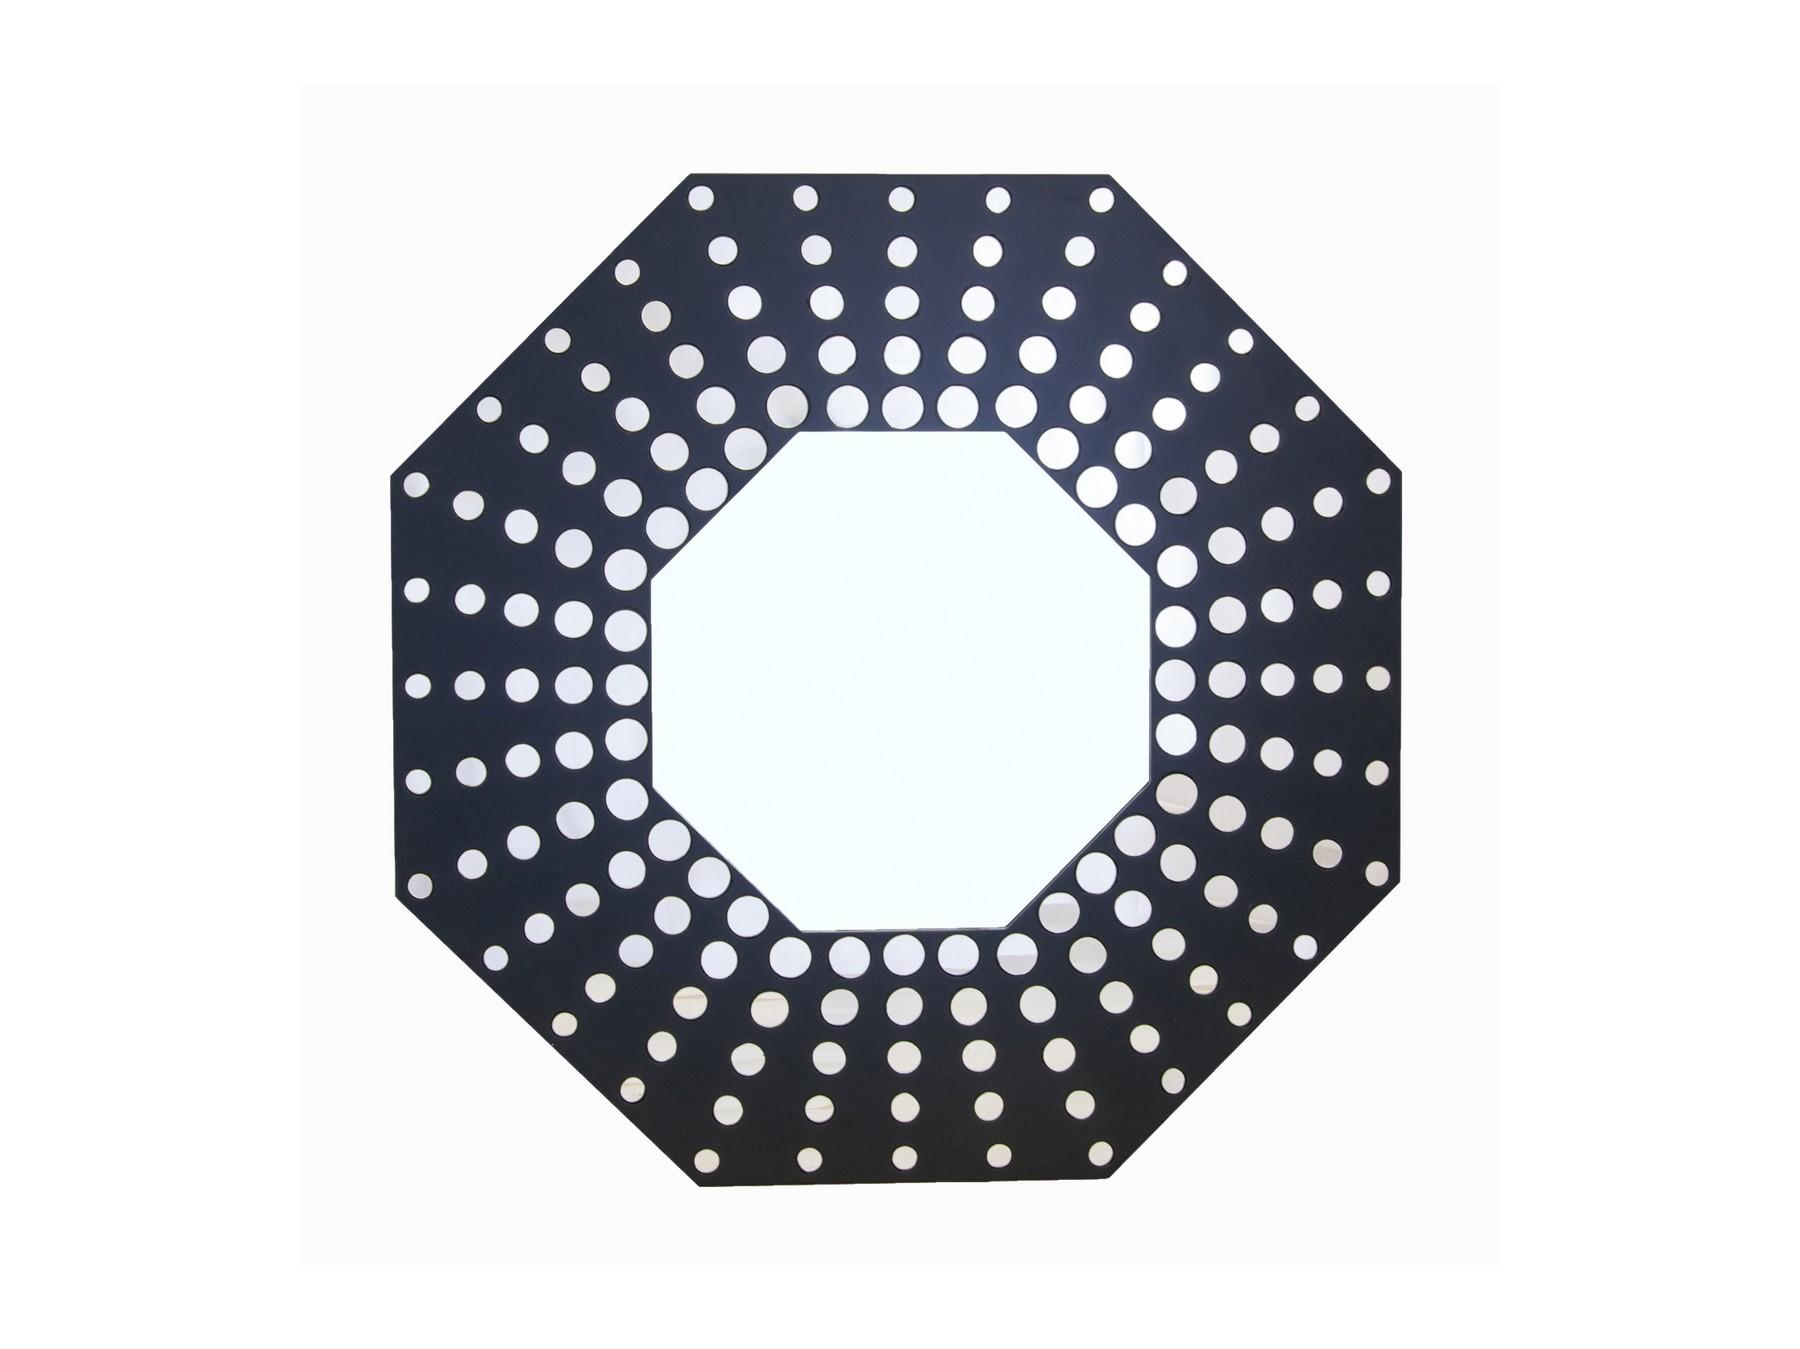 Зеркало CorbisНастенные зеркала<br>Материалы: МДФ, стекло<br><br>Material: МДФ<br>Ширина см: 90<br>Высота см: 90<br>Глубина см: 4